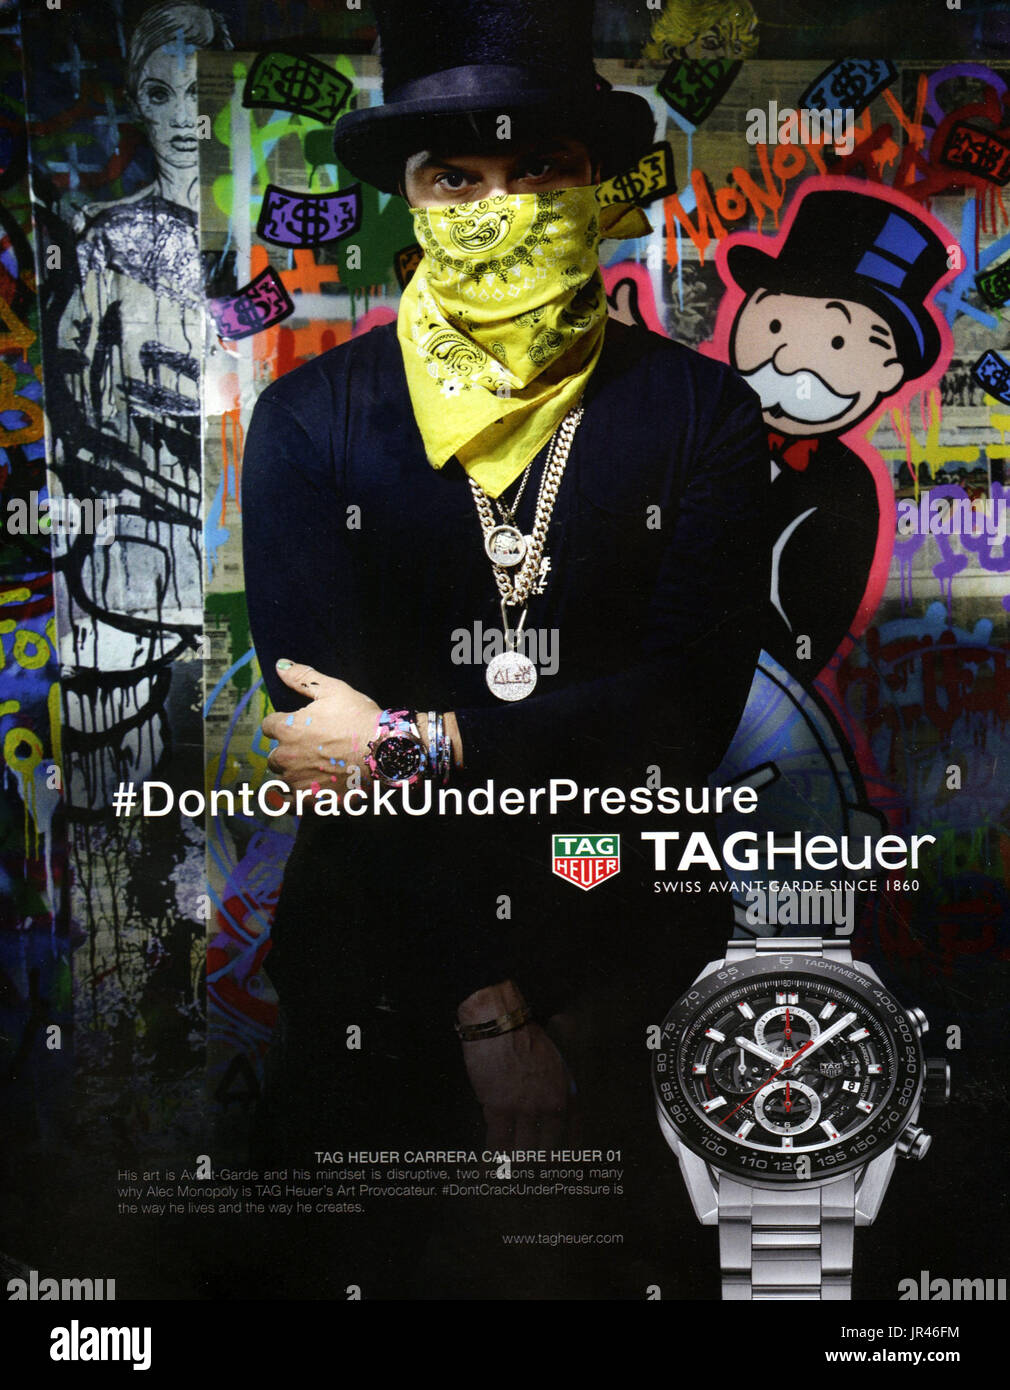 Tag Heuer Uk >> 2010s Uk Tag Heuer Magazine Advert Stock Photo 151912984